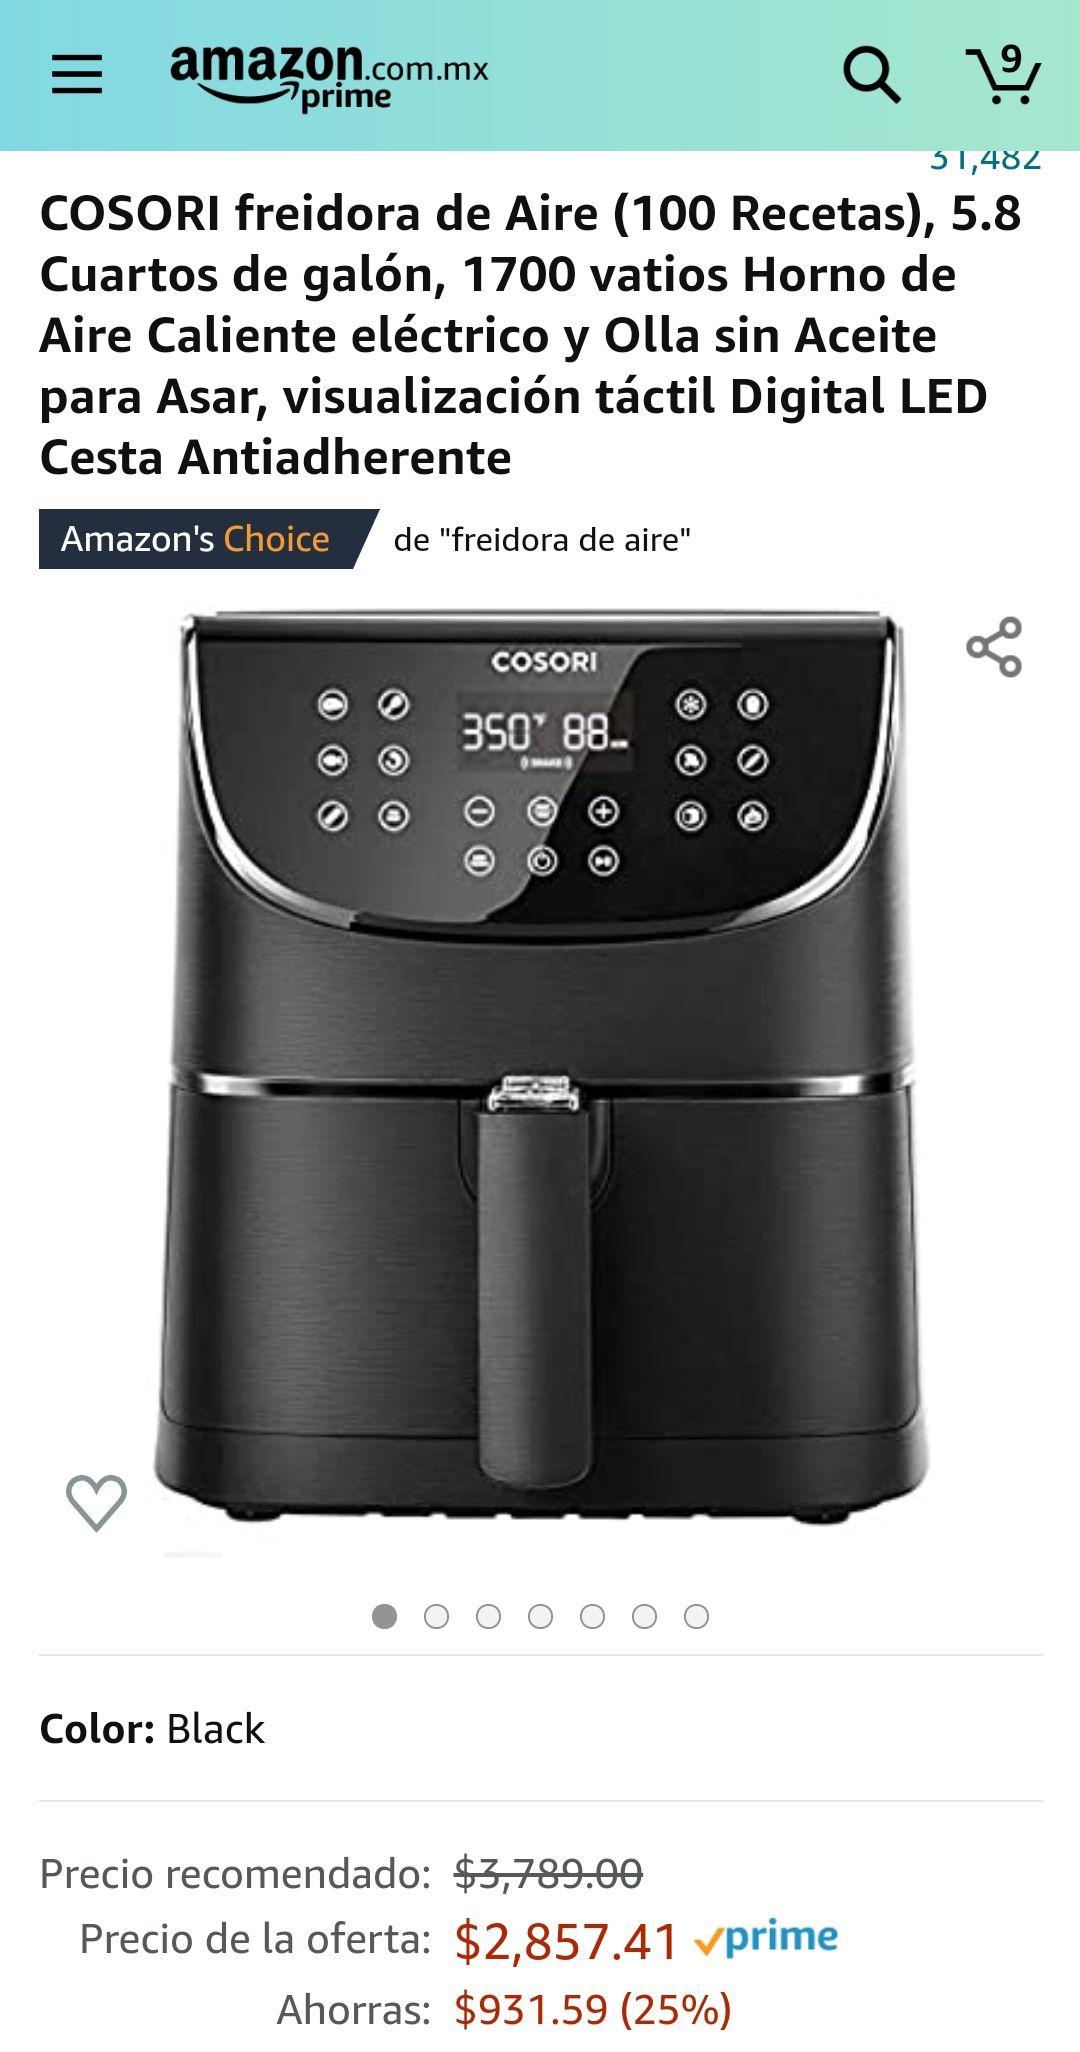 Amazon: COSORI freidora de Aire 5.8 Cuartos de galón, 1700 vatios Horno de Aire Caliente eléctrico y Olla sin Aceite para Asar